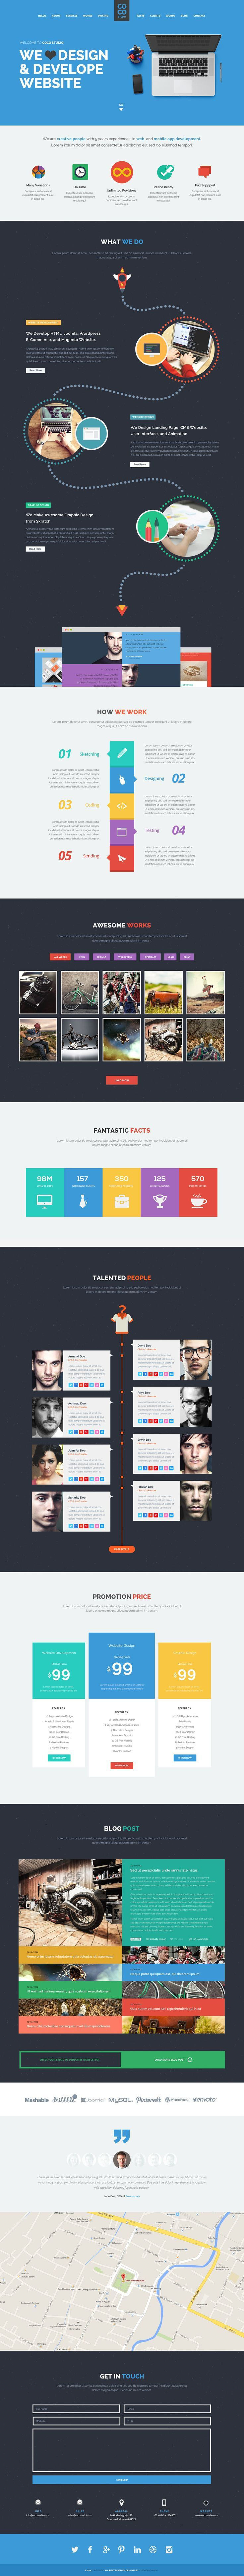 Best Web Templates Images On Pinterest Website Designs Design - Fresh podcast website template scheme